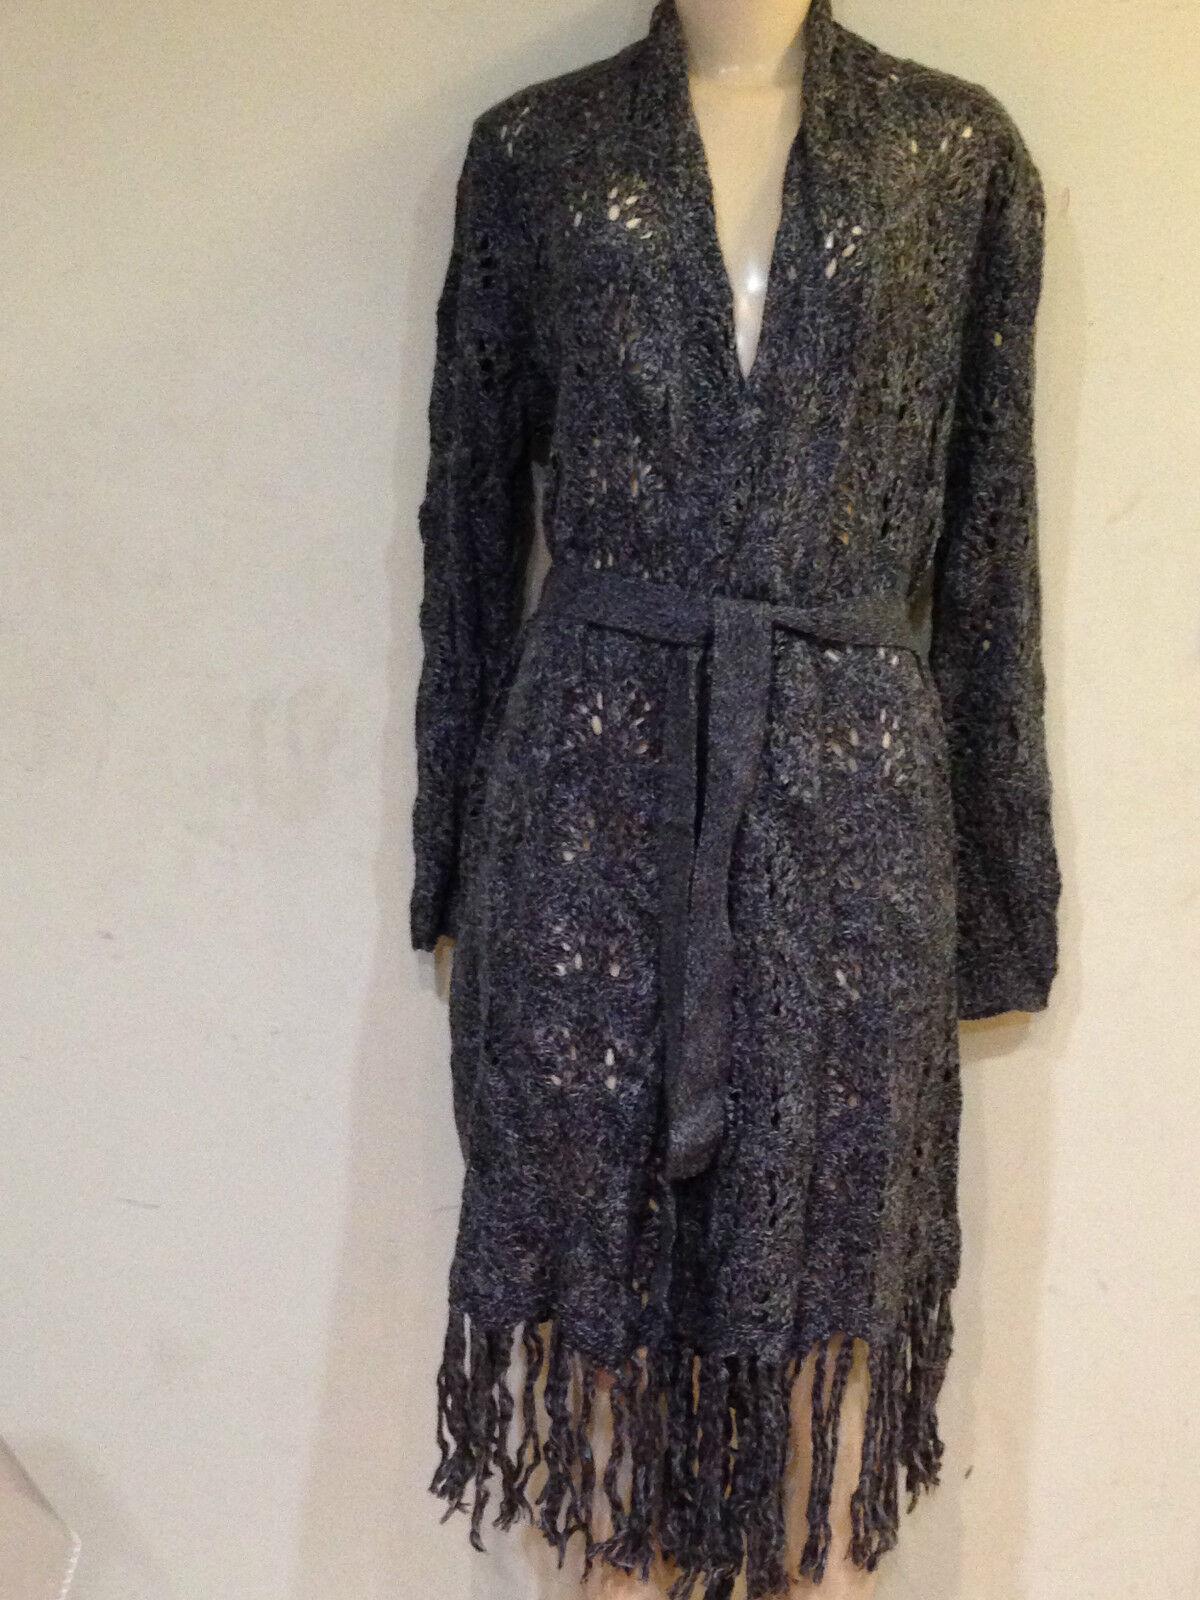 Damen Winter Herbst Frühling Licht lange Strickjacke Mantel Jacke Größe L $ 130